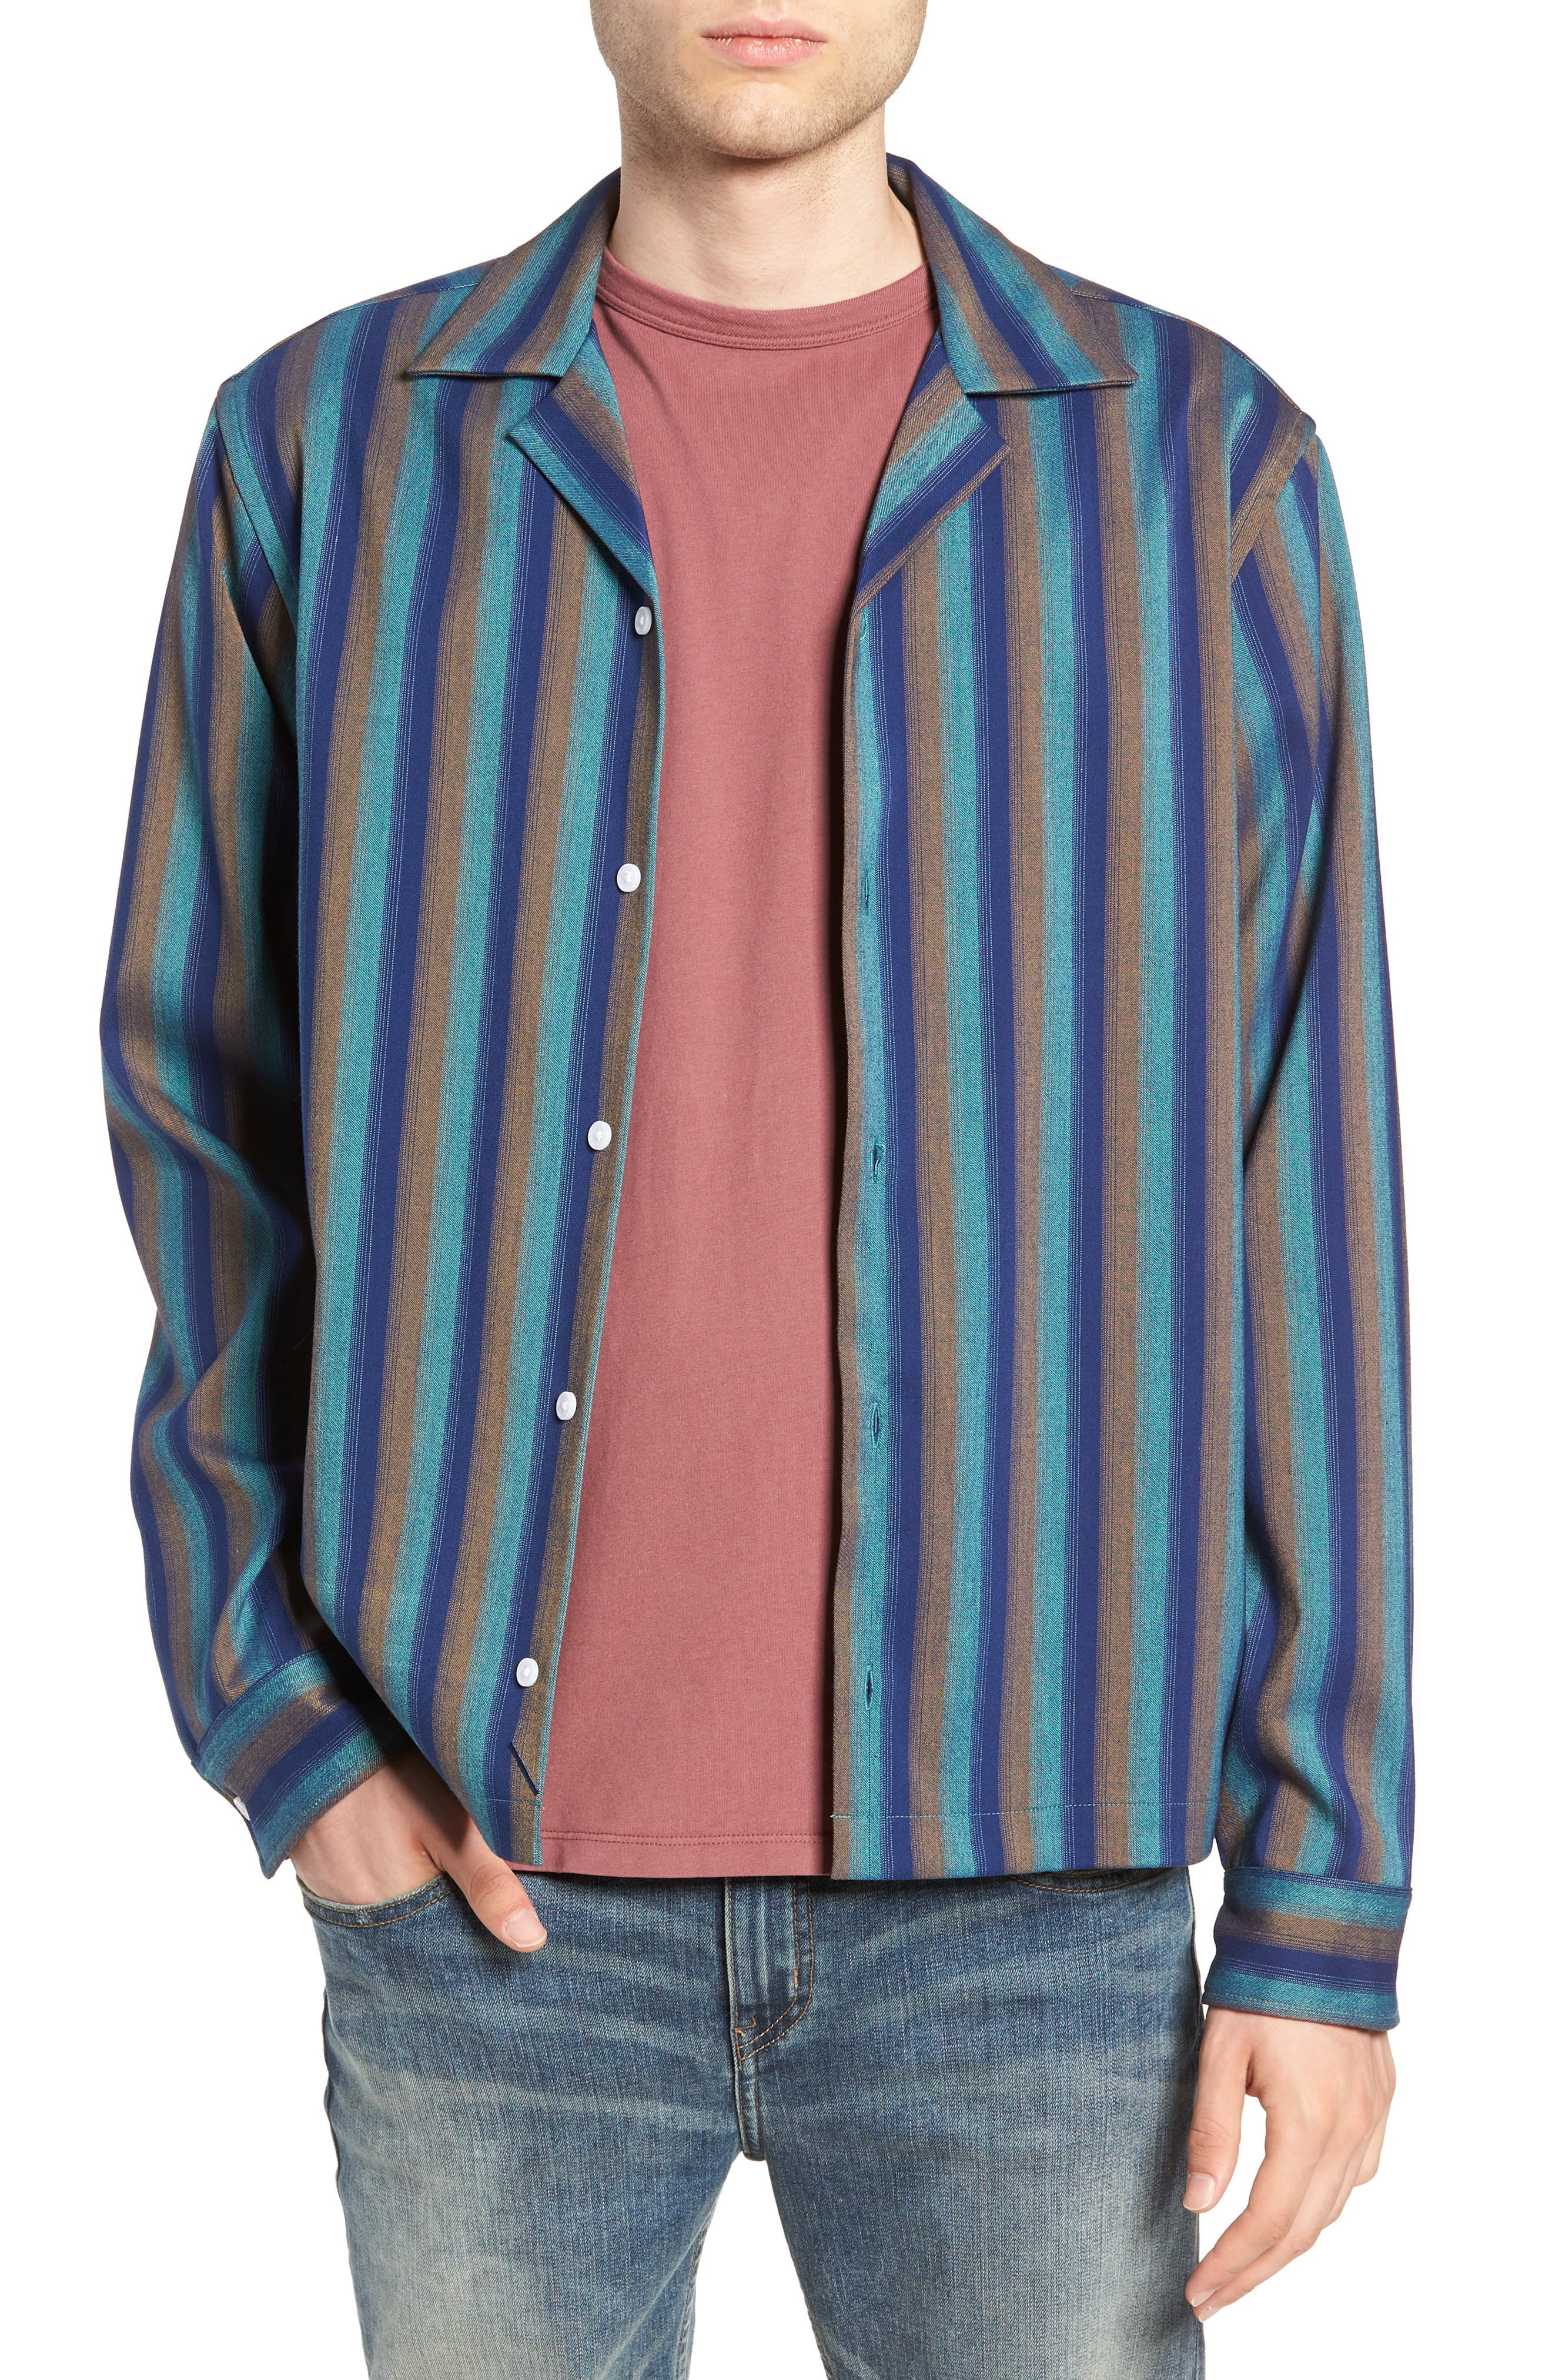 Marco Frequency Long Sleeve Woven Shirt,                             Main thumbnail 1, color,                             334